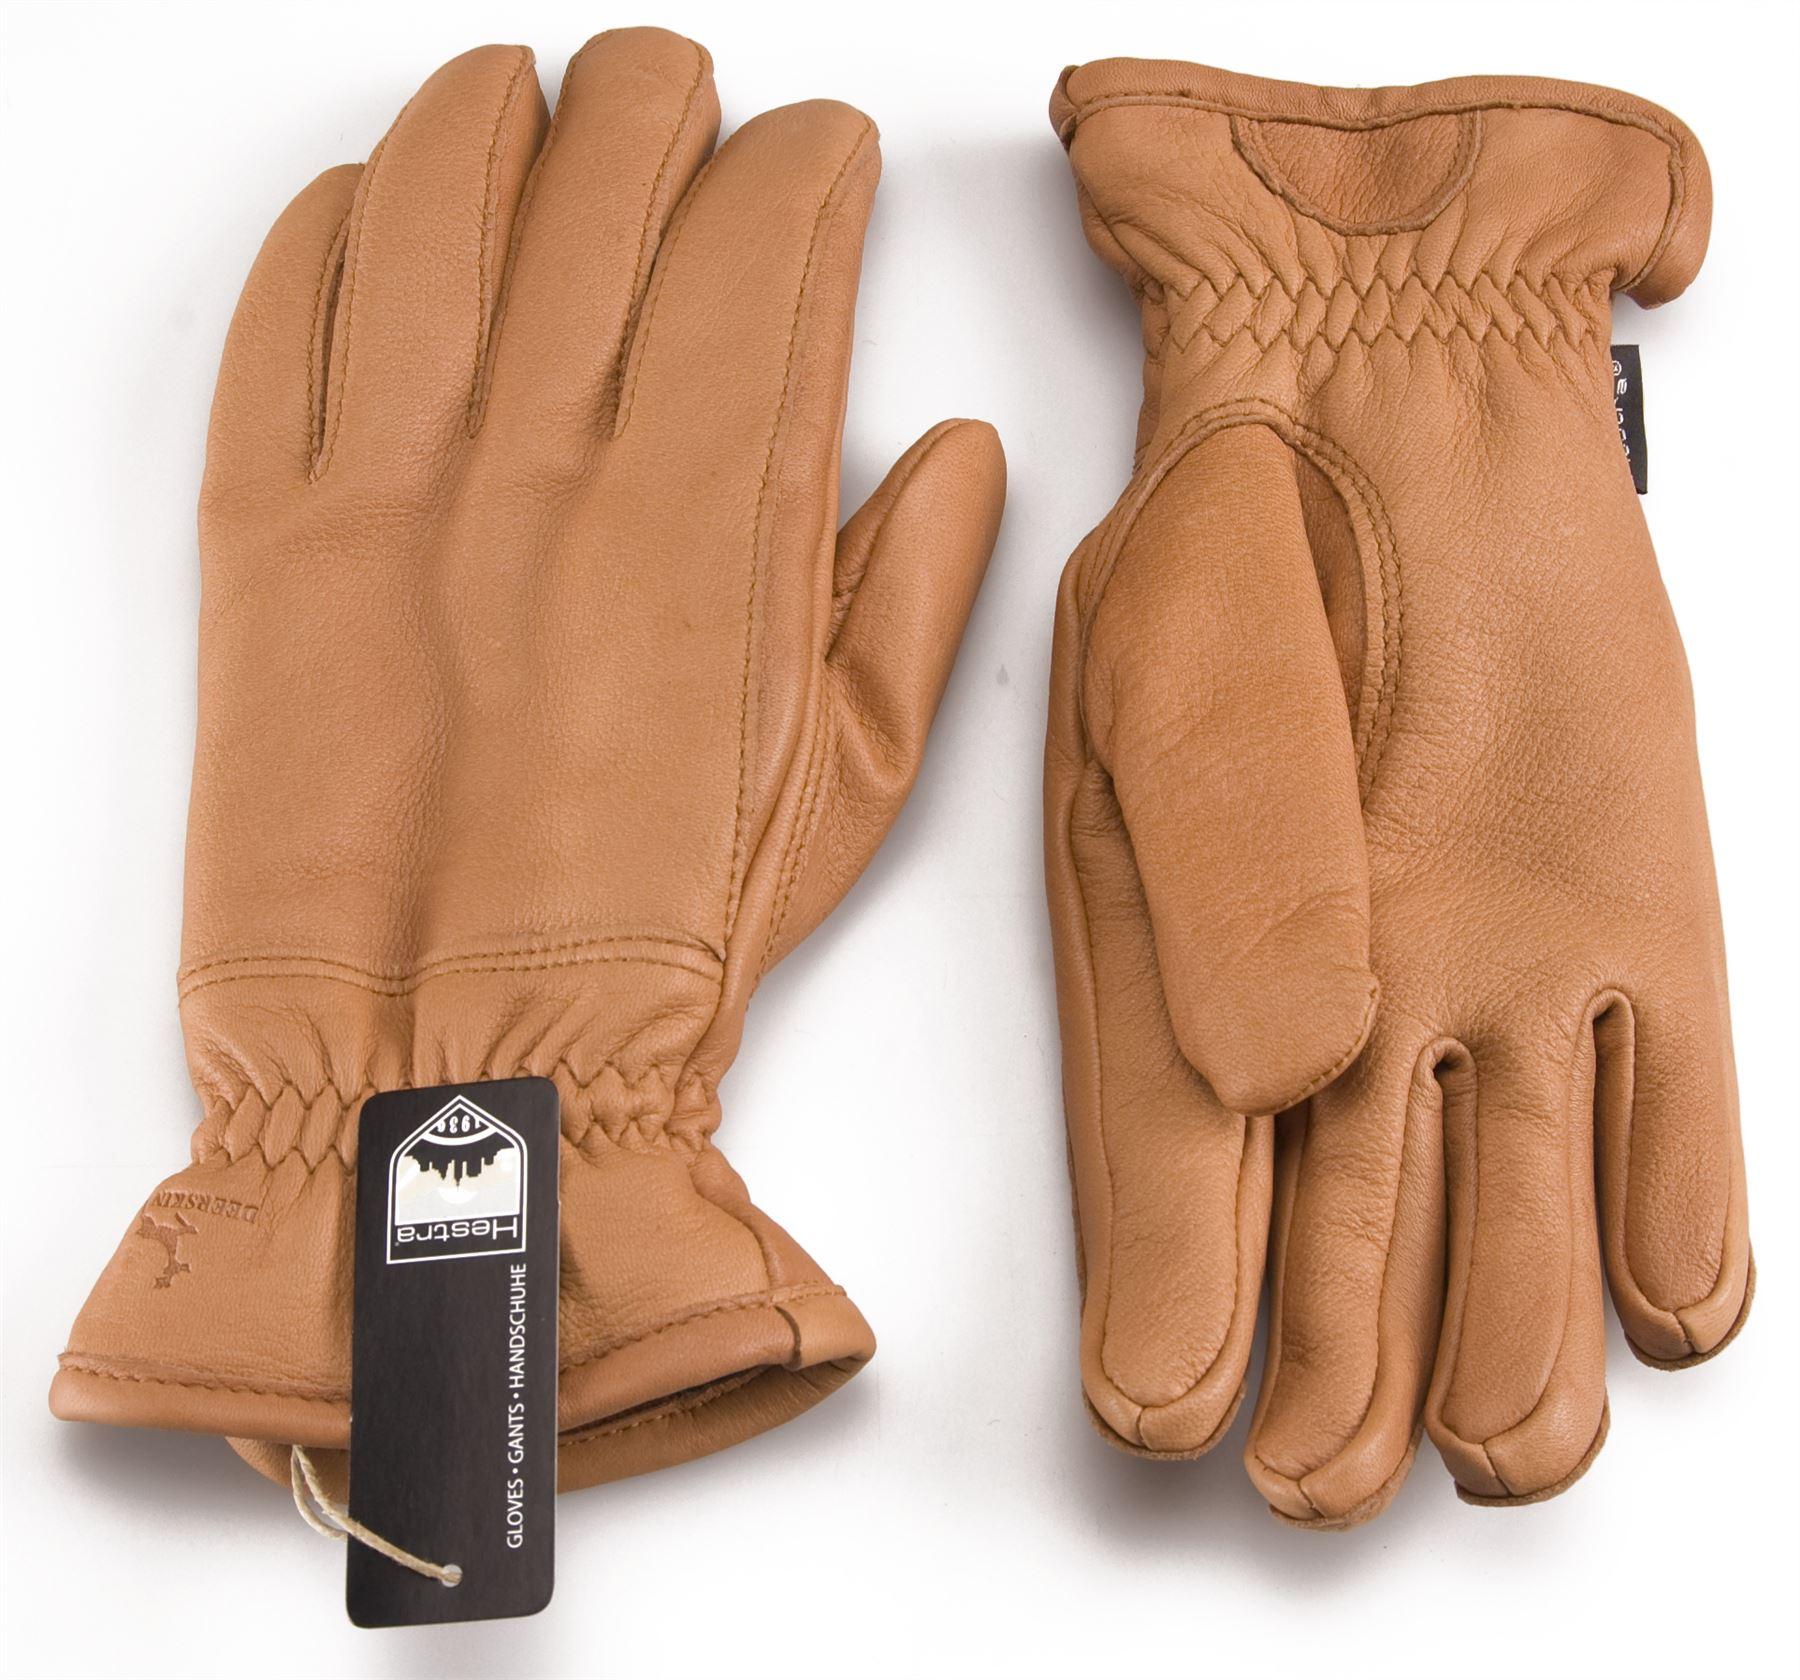 Hestra Premium Mens Deer Skin Leather Gloves Fleece Lined